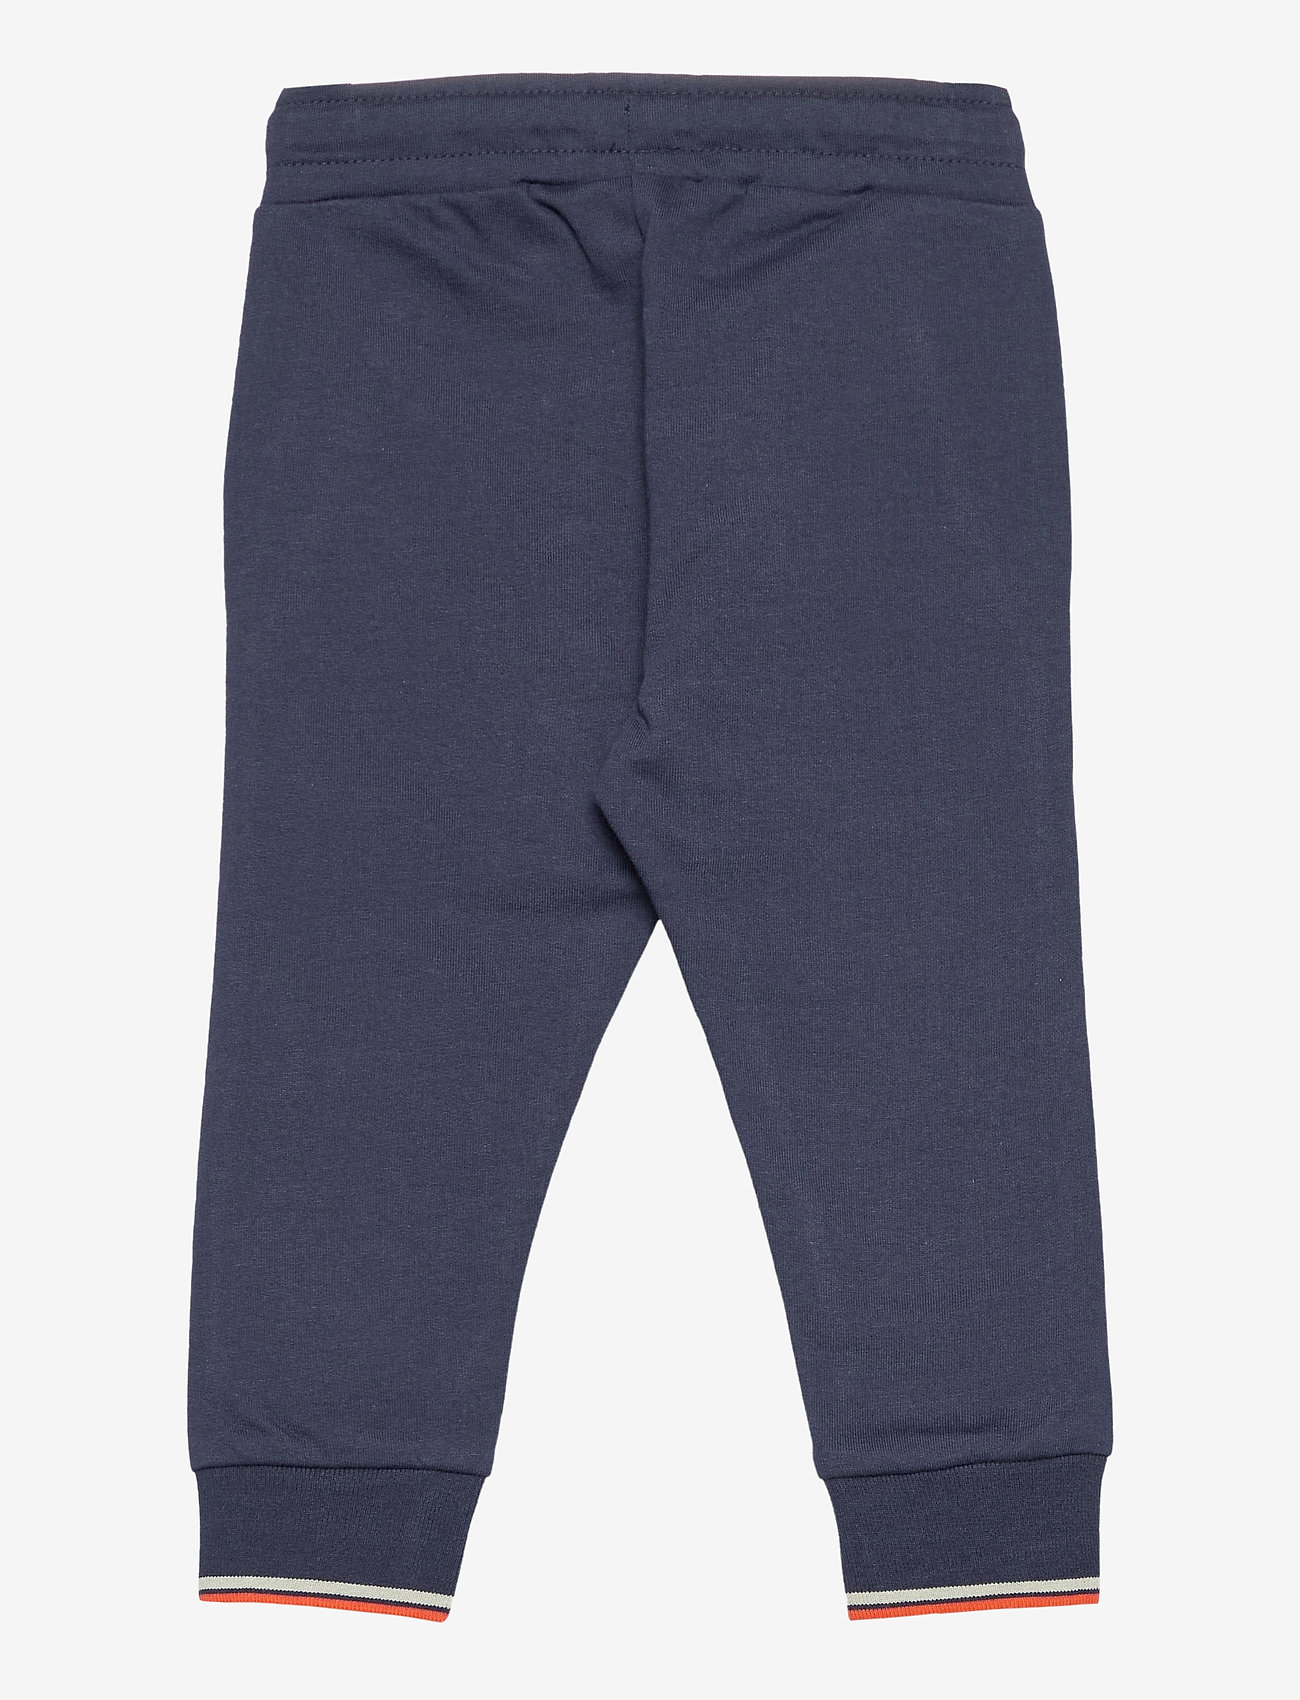 Hummel - hmlCARL PANTS - sweatpants - black iris - 1